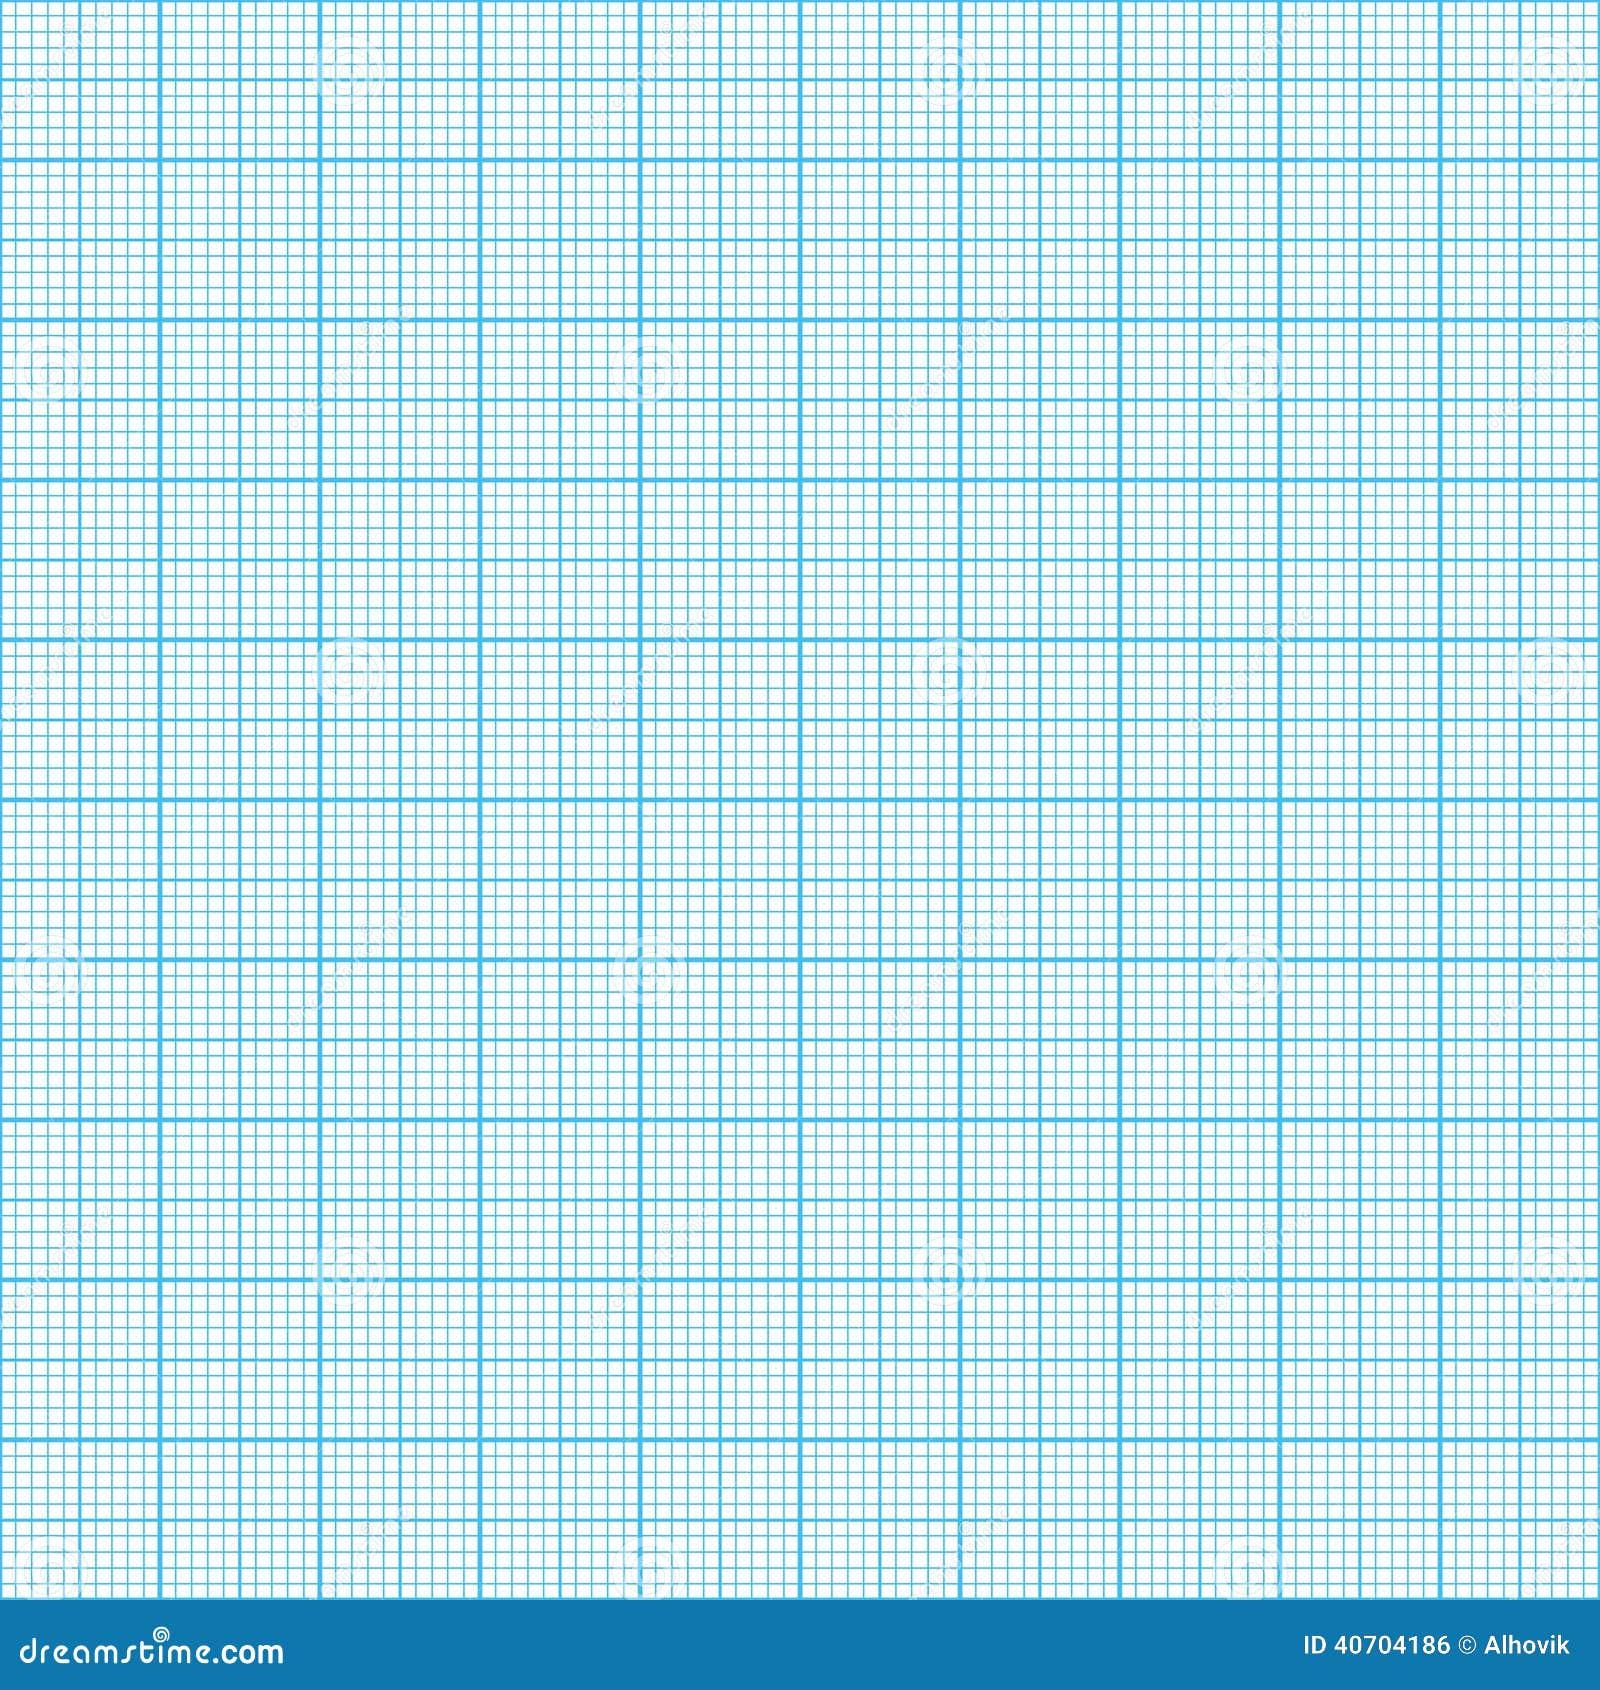 Model Wiring Trane Diagram Tuc80c942b7 Diagrams Schematics Sony Radio 6733294 A4 Paper On For 5 Designs